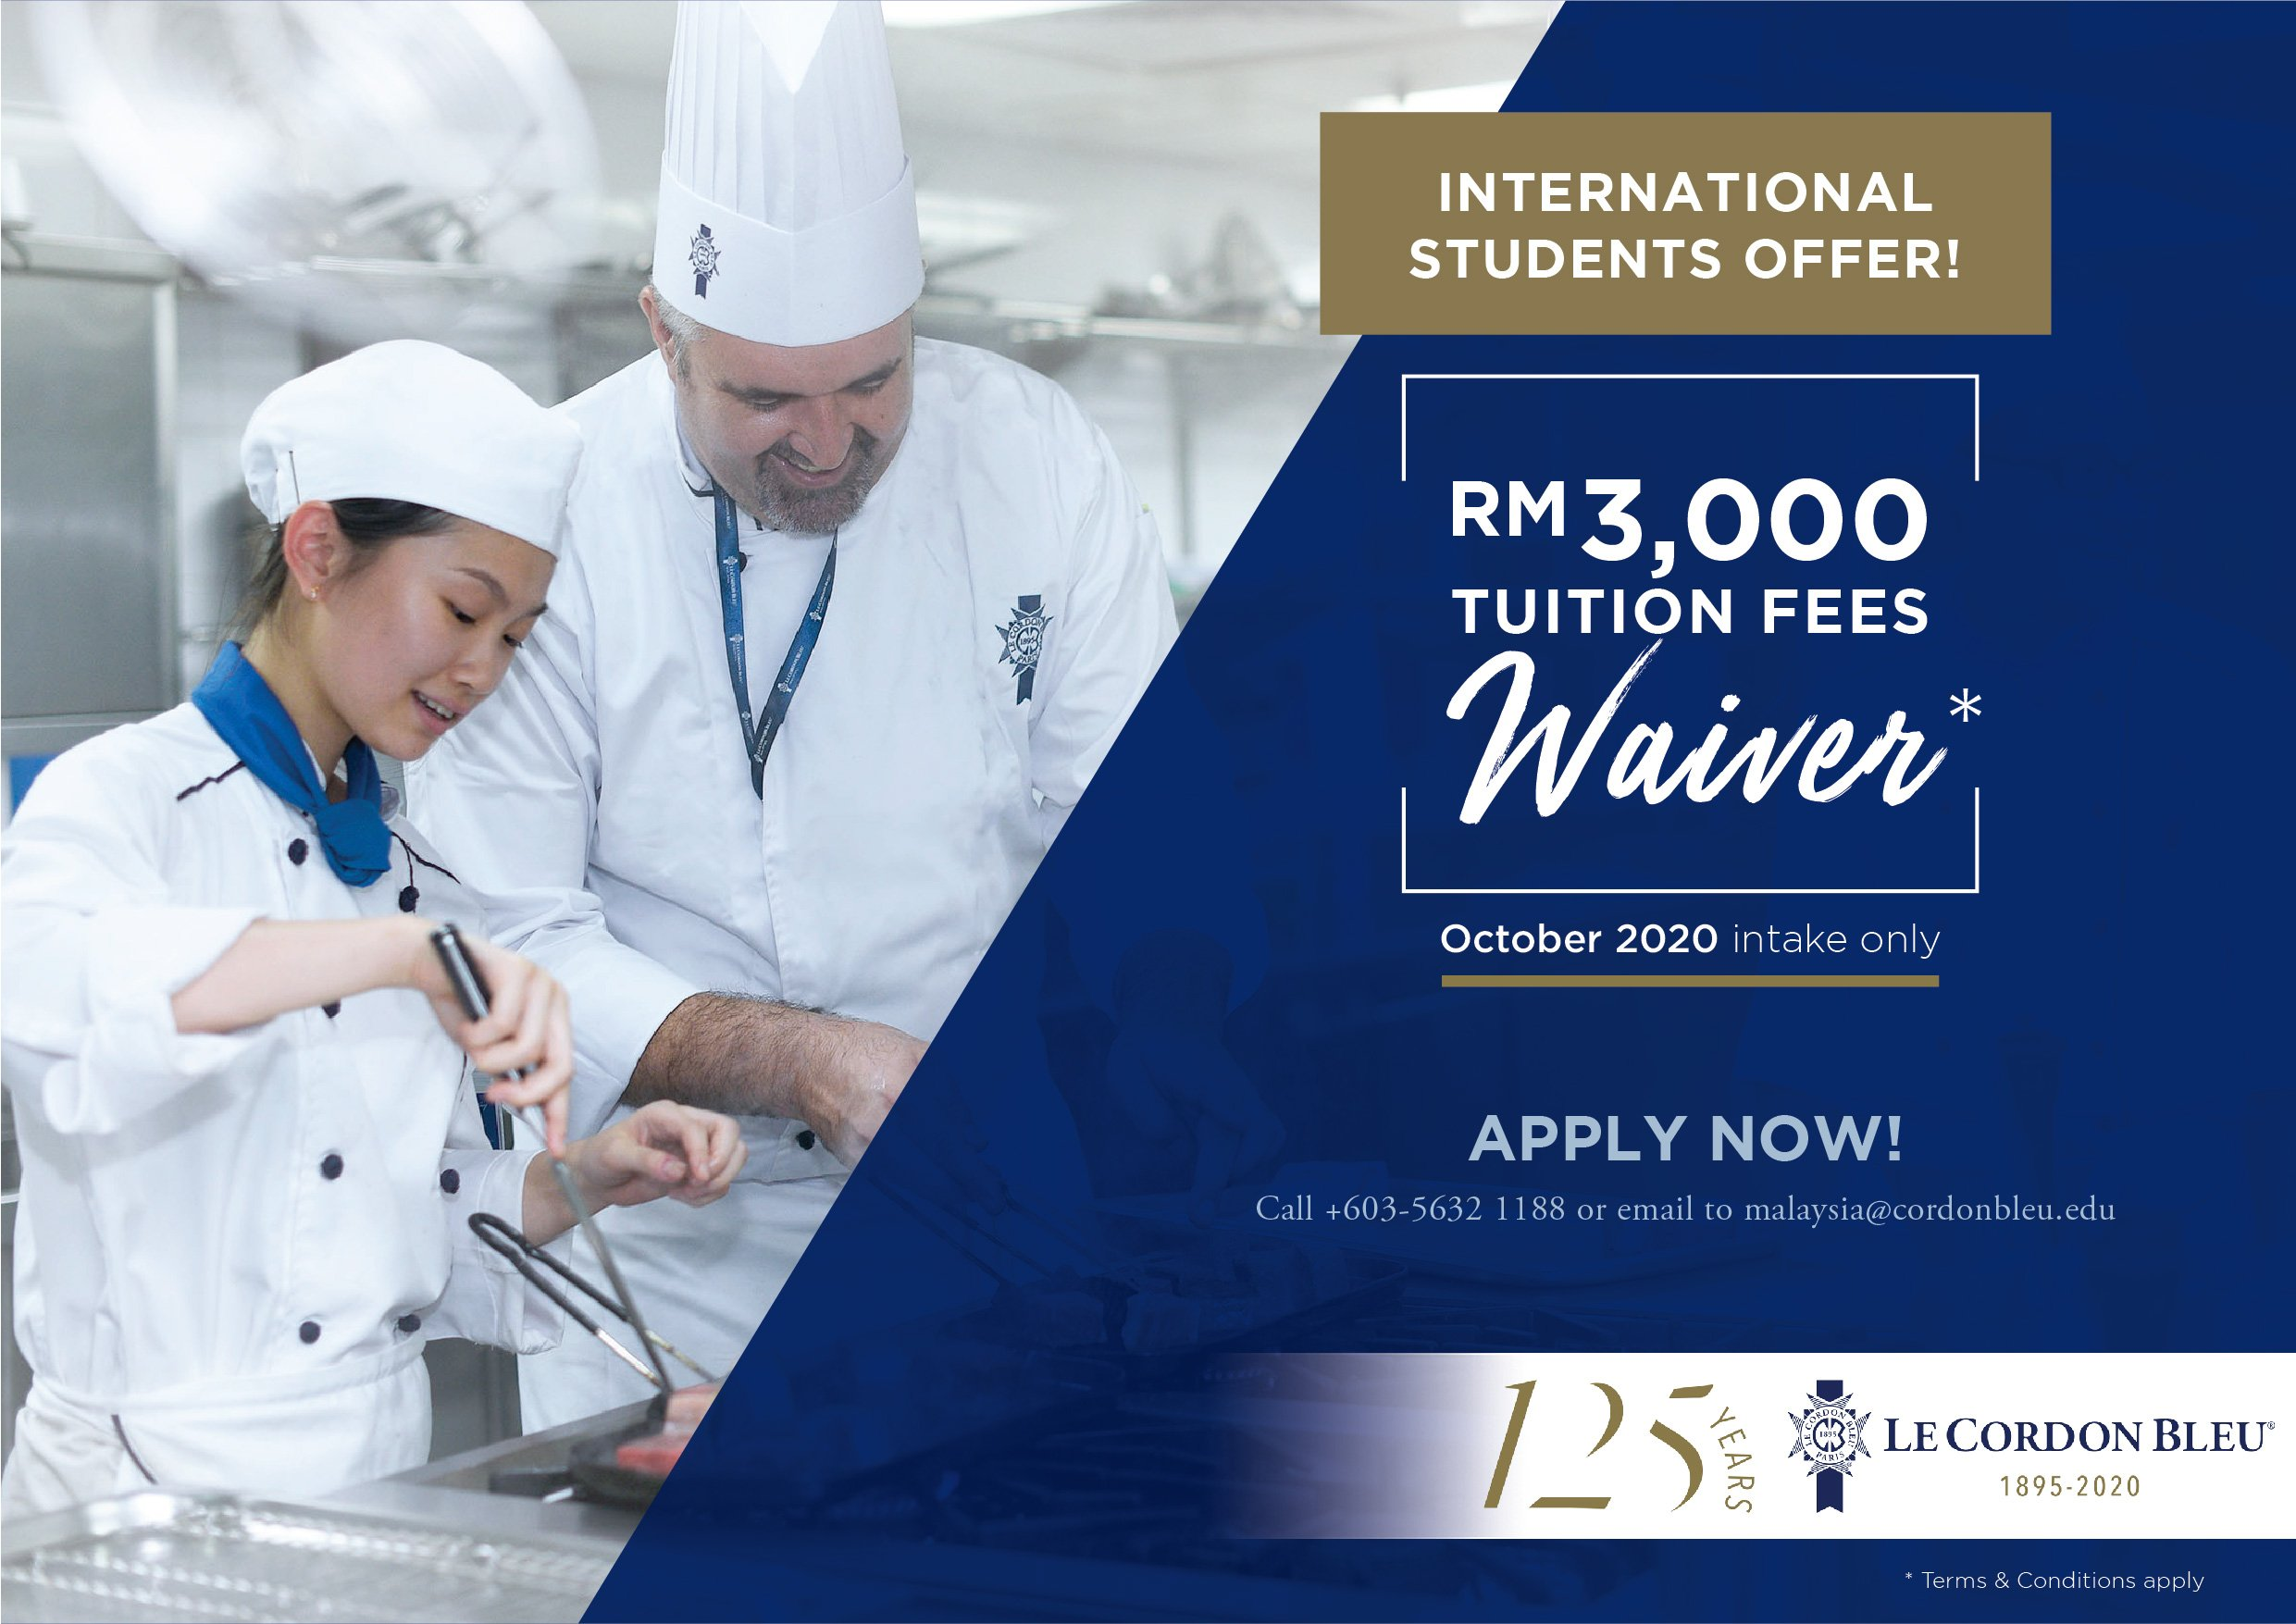 3000 rebate for international students